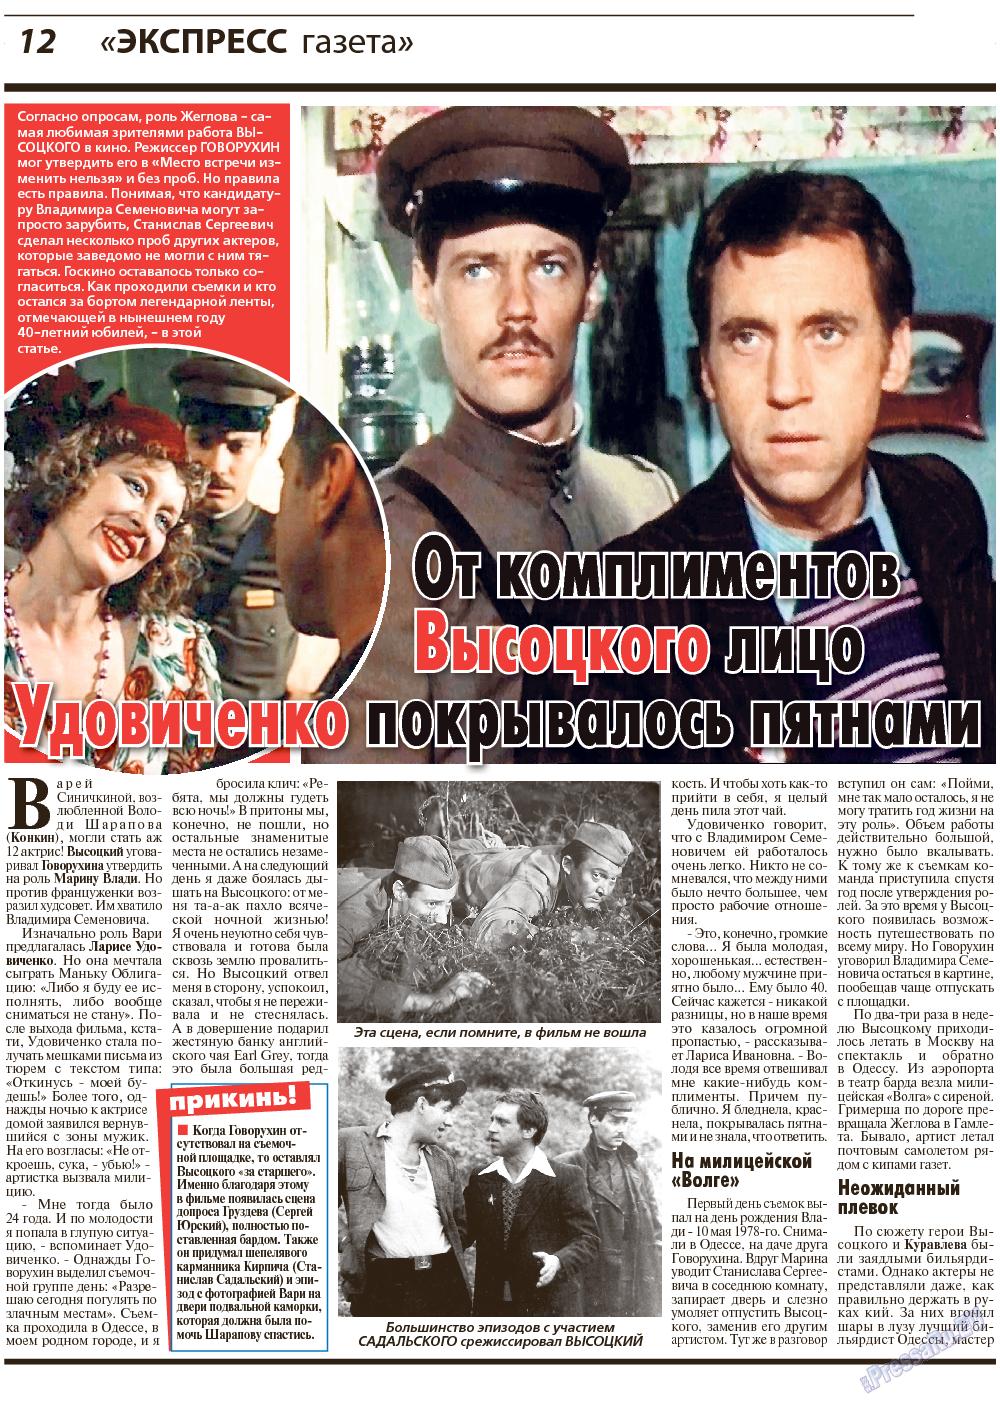 Экспресс газета (газета). 2018 год, номер 2, стр. 12